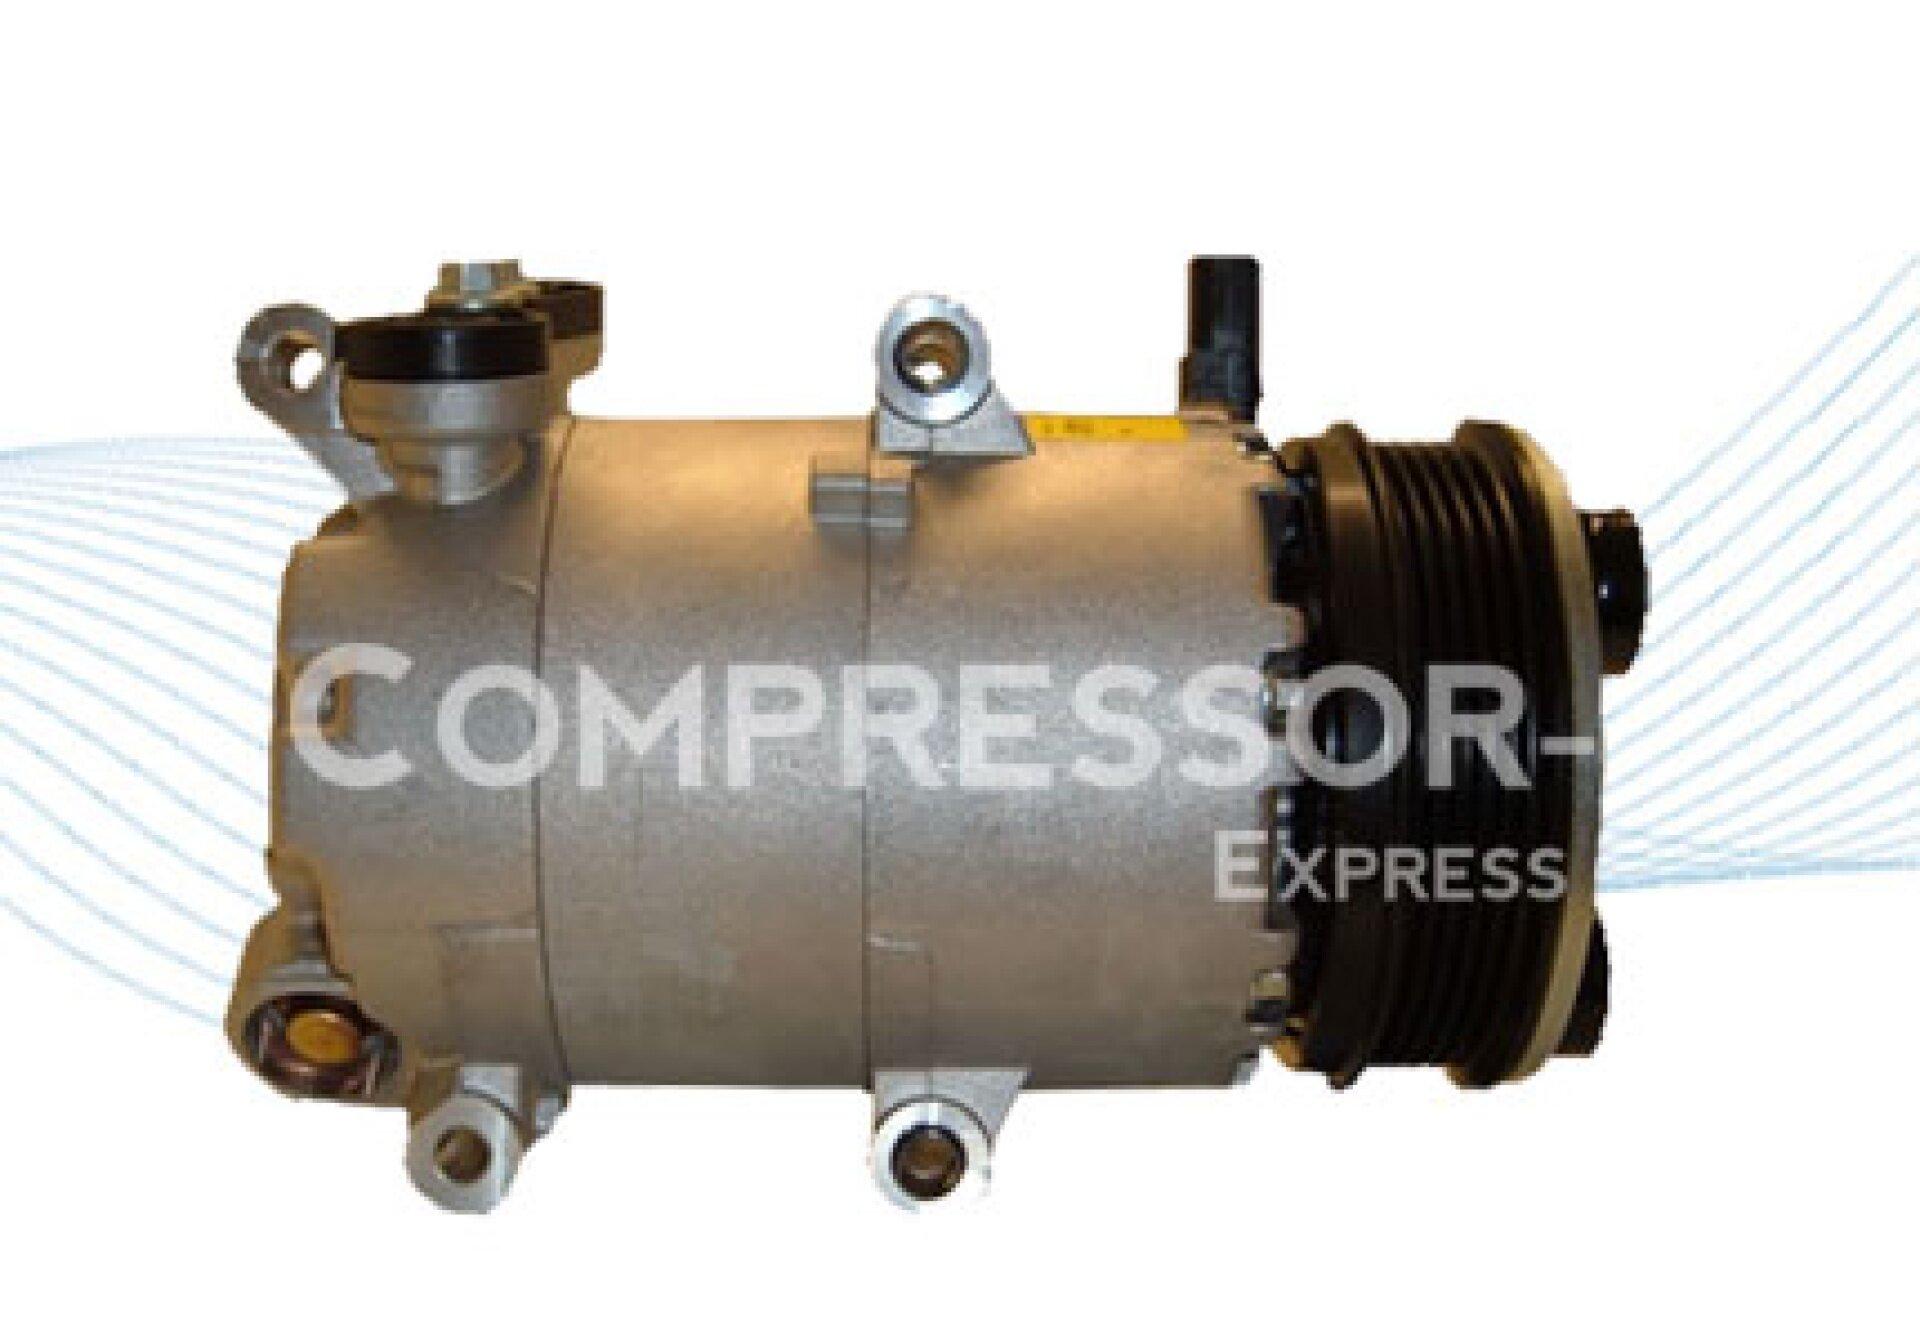 Visteon visteon compresor de aire acondicionado 1333040 for Compresor de aire acondicionado